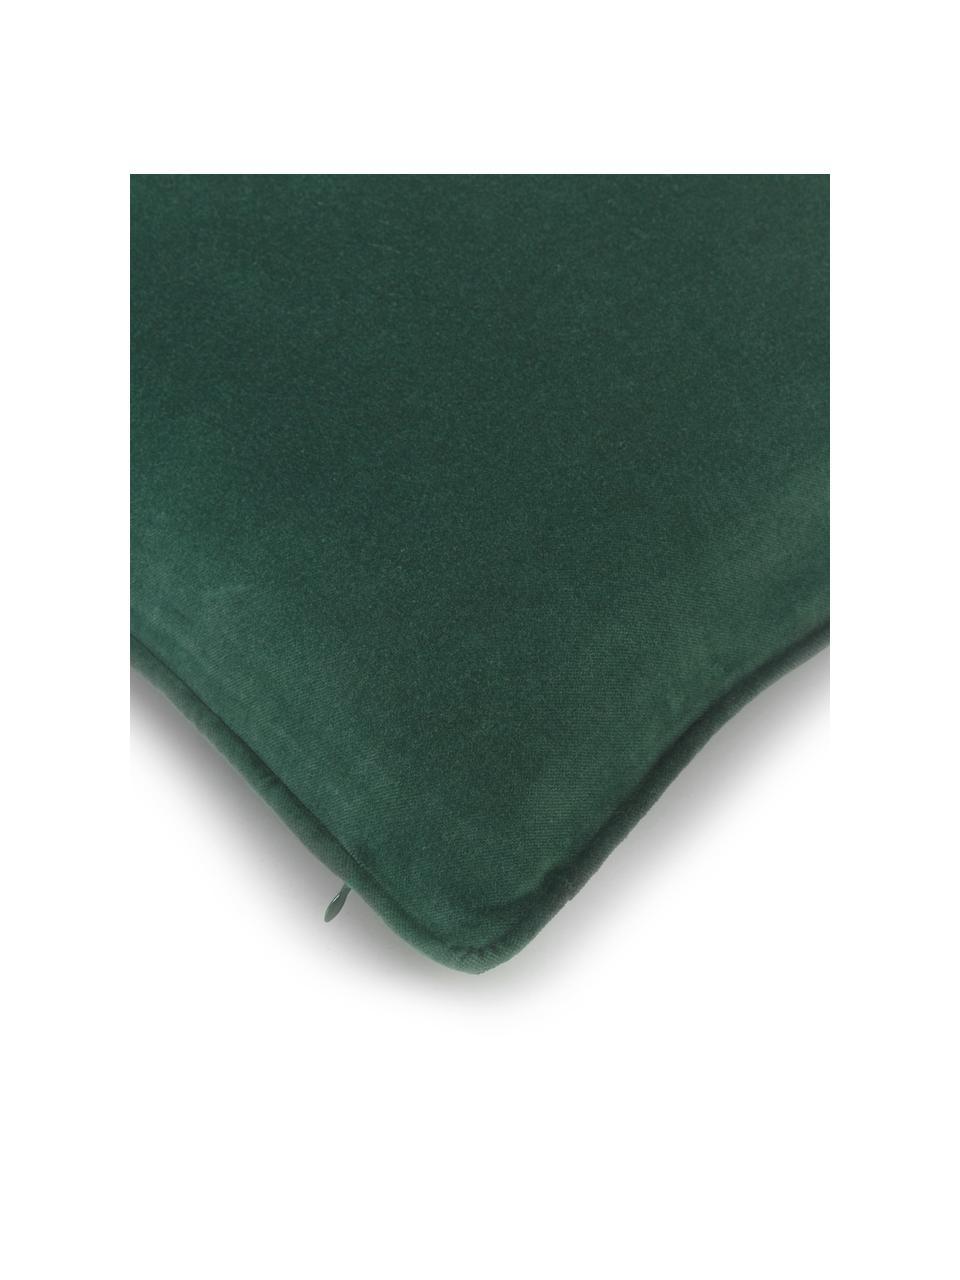 Effen fluwelen kussenhoes Dana in smaragdgroen, 100% katoenfluweel, Smaragdgroen, 50 x 50 cm